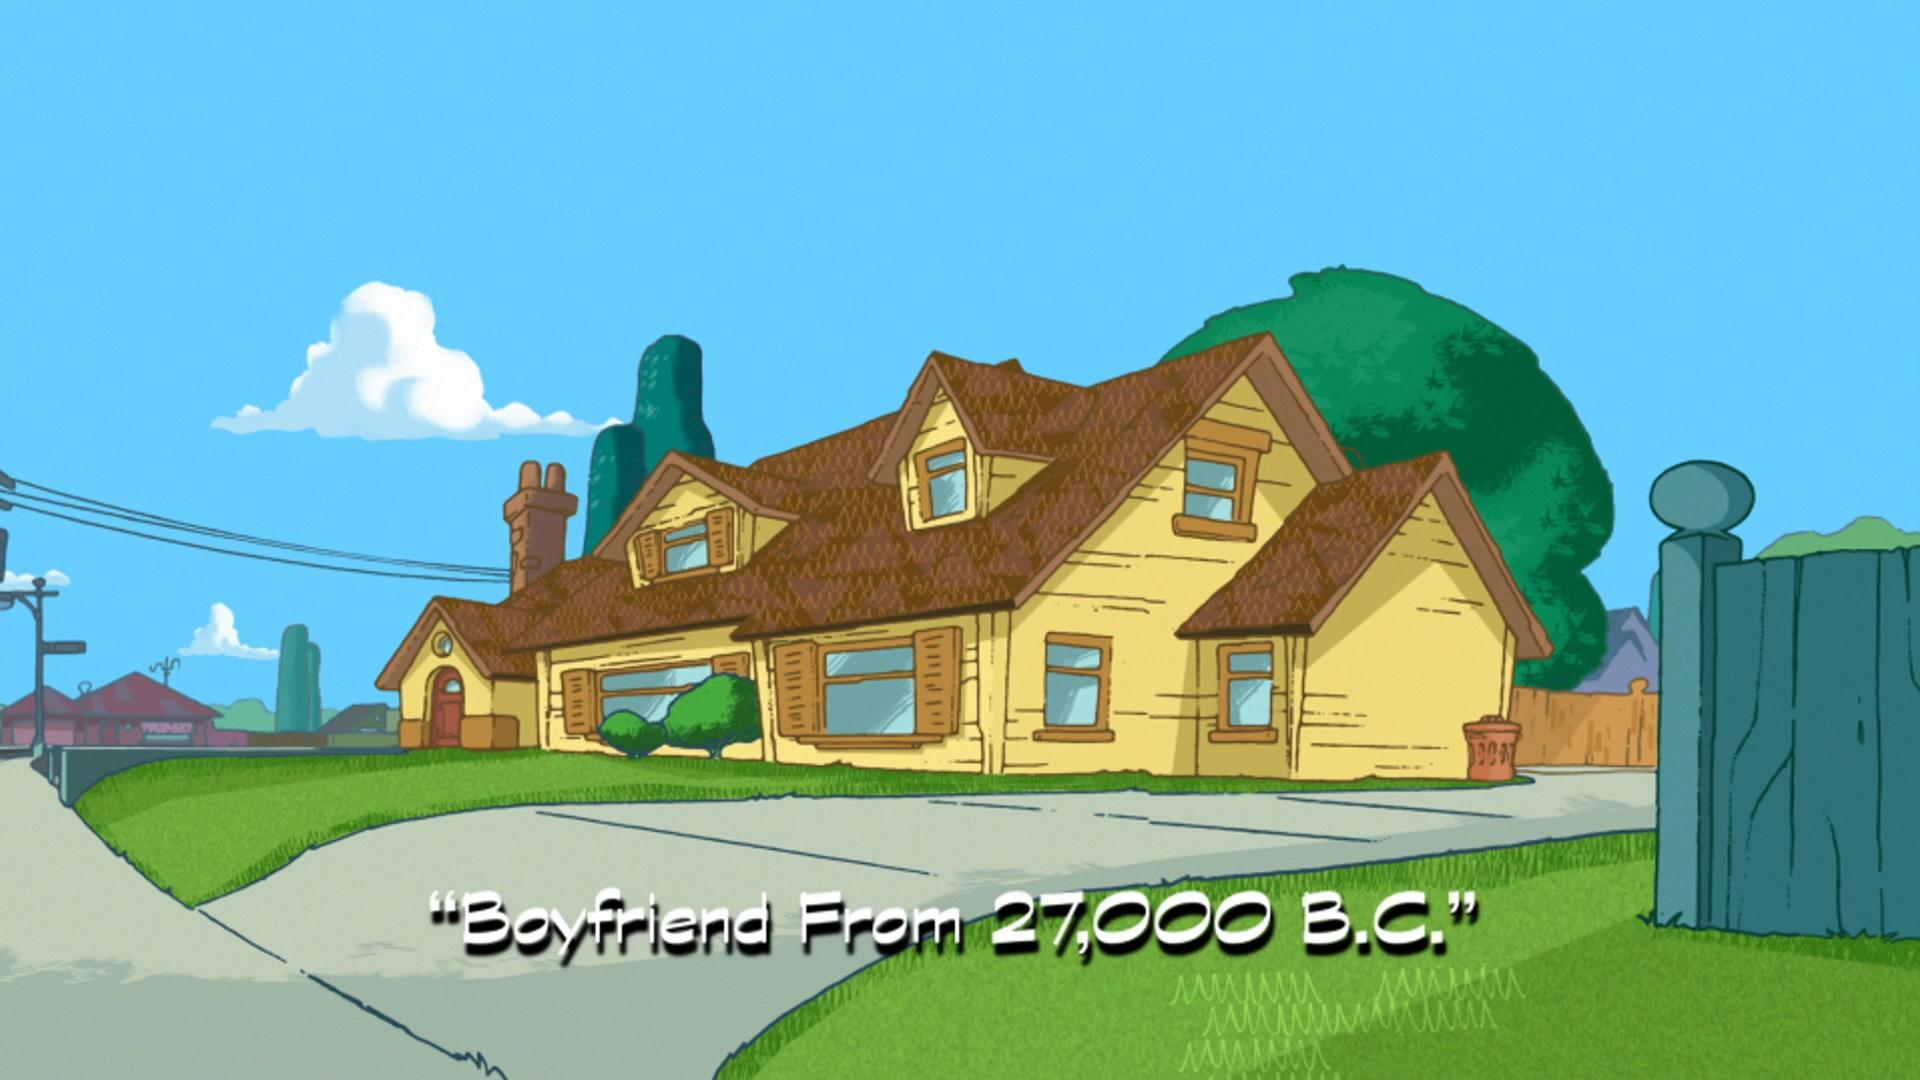 File:Boyfriend From 27,000 B.C. title card.jpg